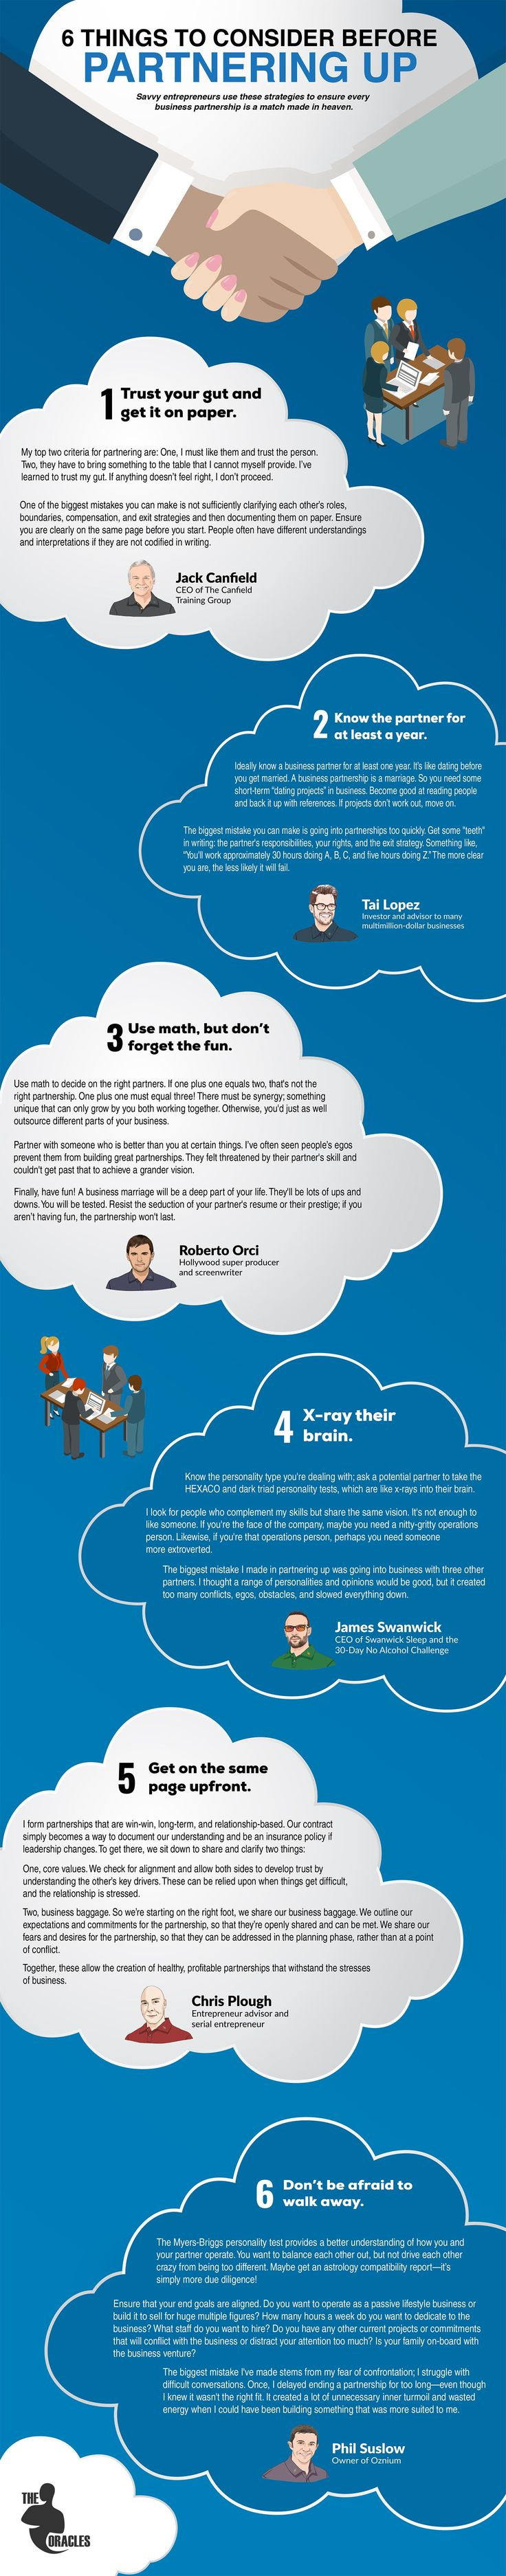 Savvy entrepreneurs use these strategies to ensure